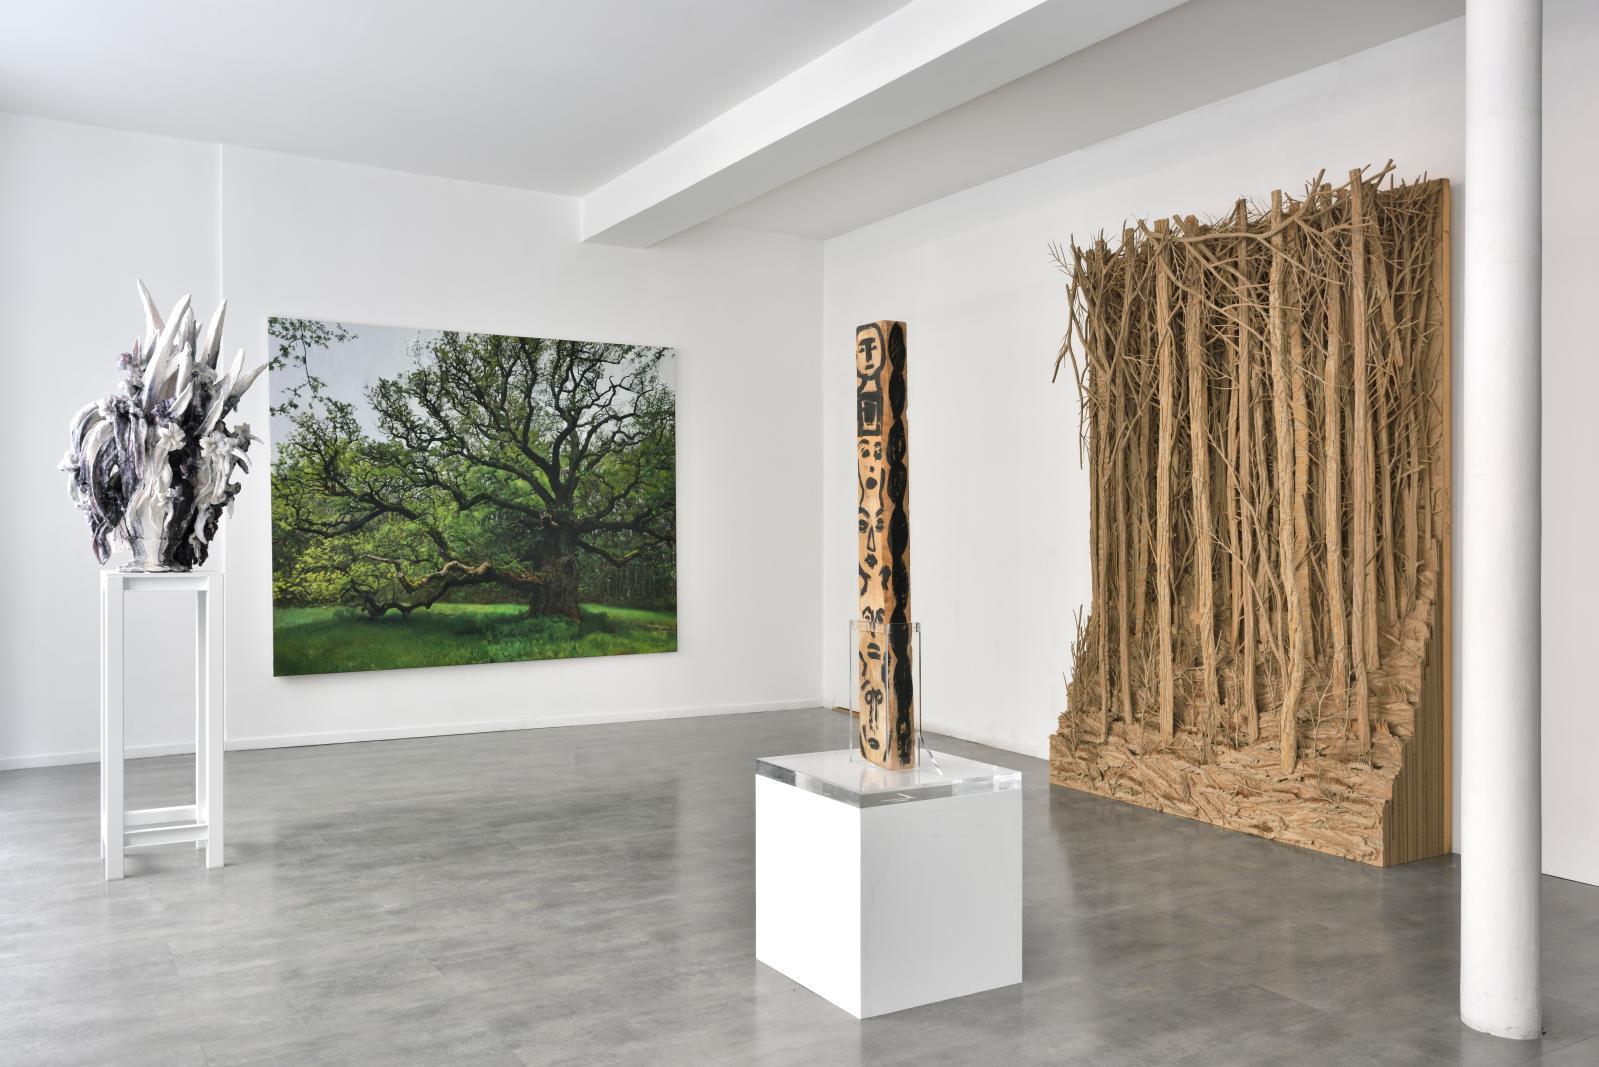 Vue de l'exposition «Woods», galerie Suzanne Tarasieve, Paris, 2019: Kriki, Light, 2019 - Shanthamani. M, Upside Down Tree, 2019.